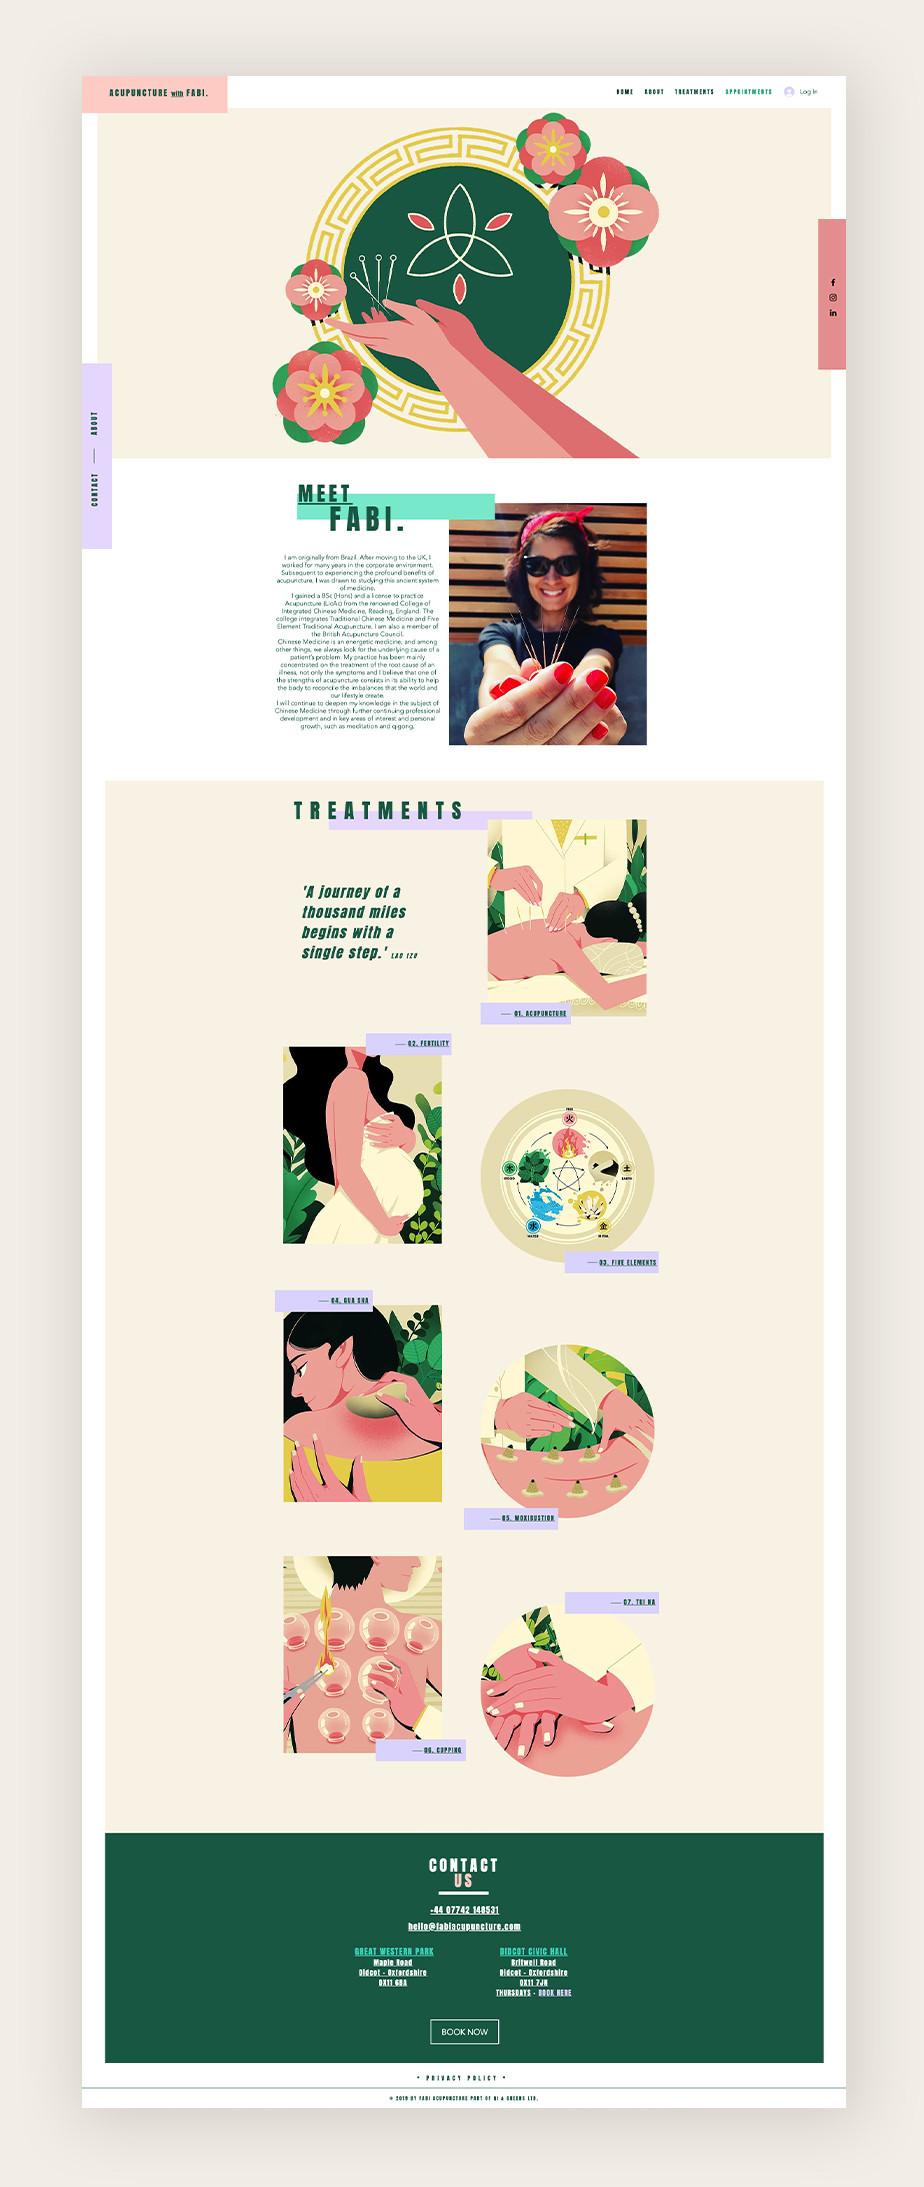 Acupuncture with Fabiのオンライン予約サイト